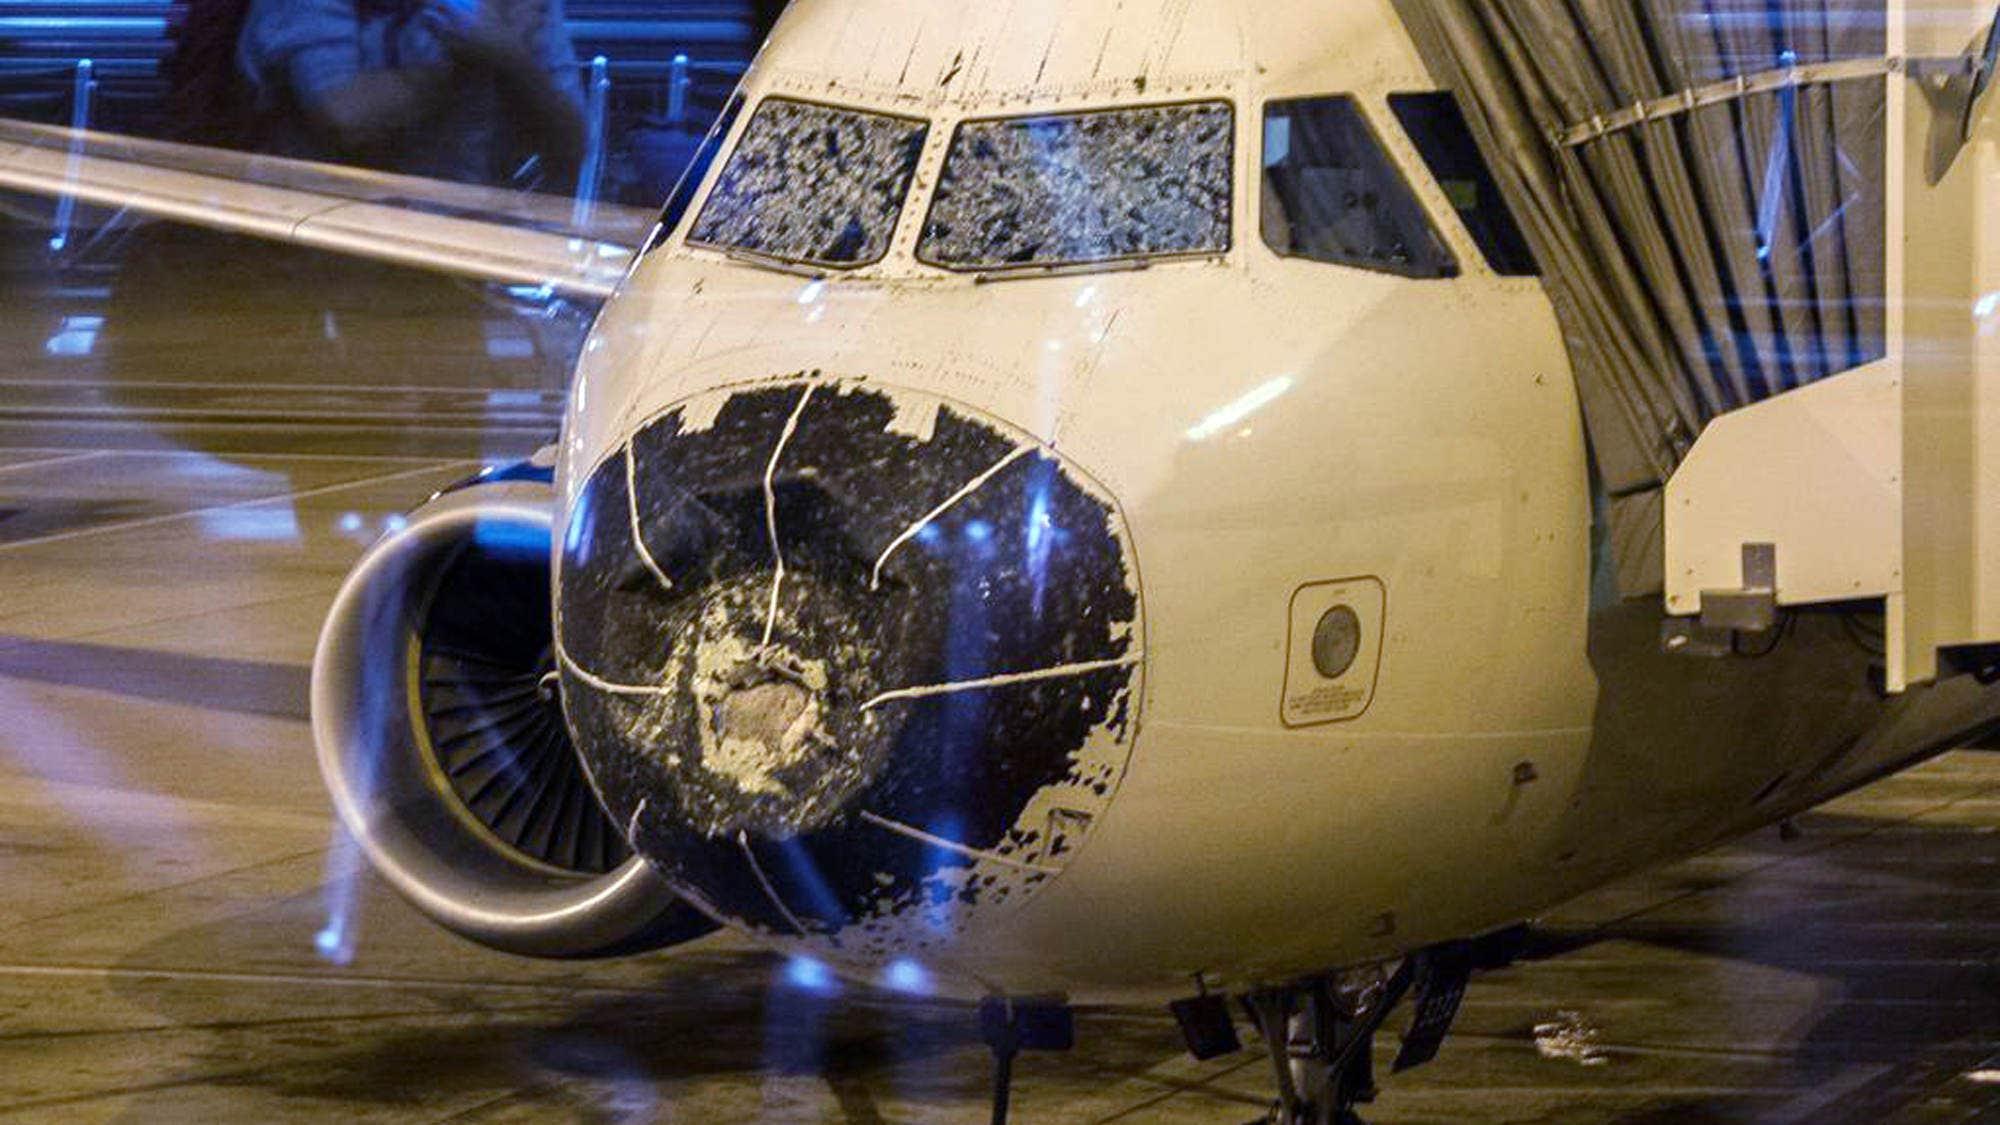 Delta Airlines Flight From Boston Lands In Denver After